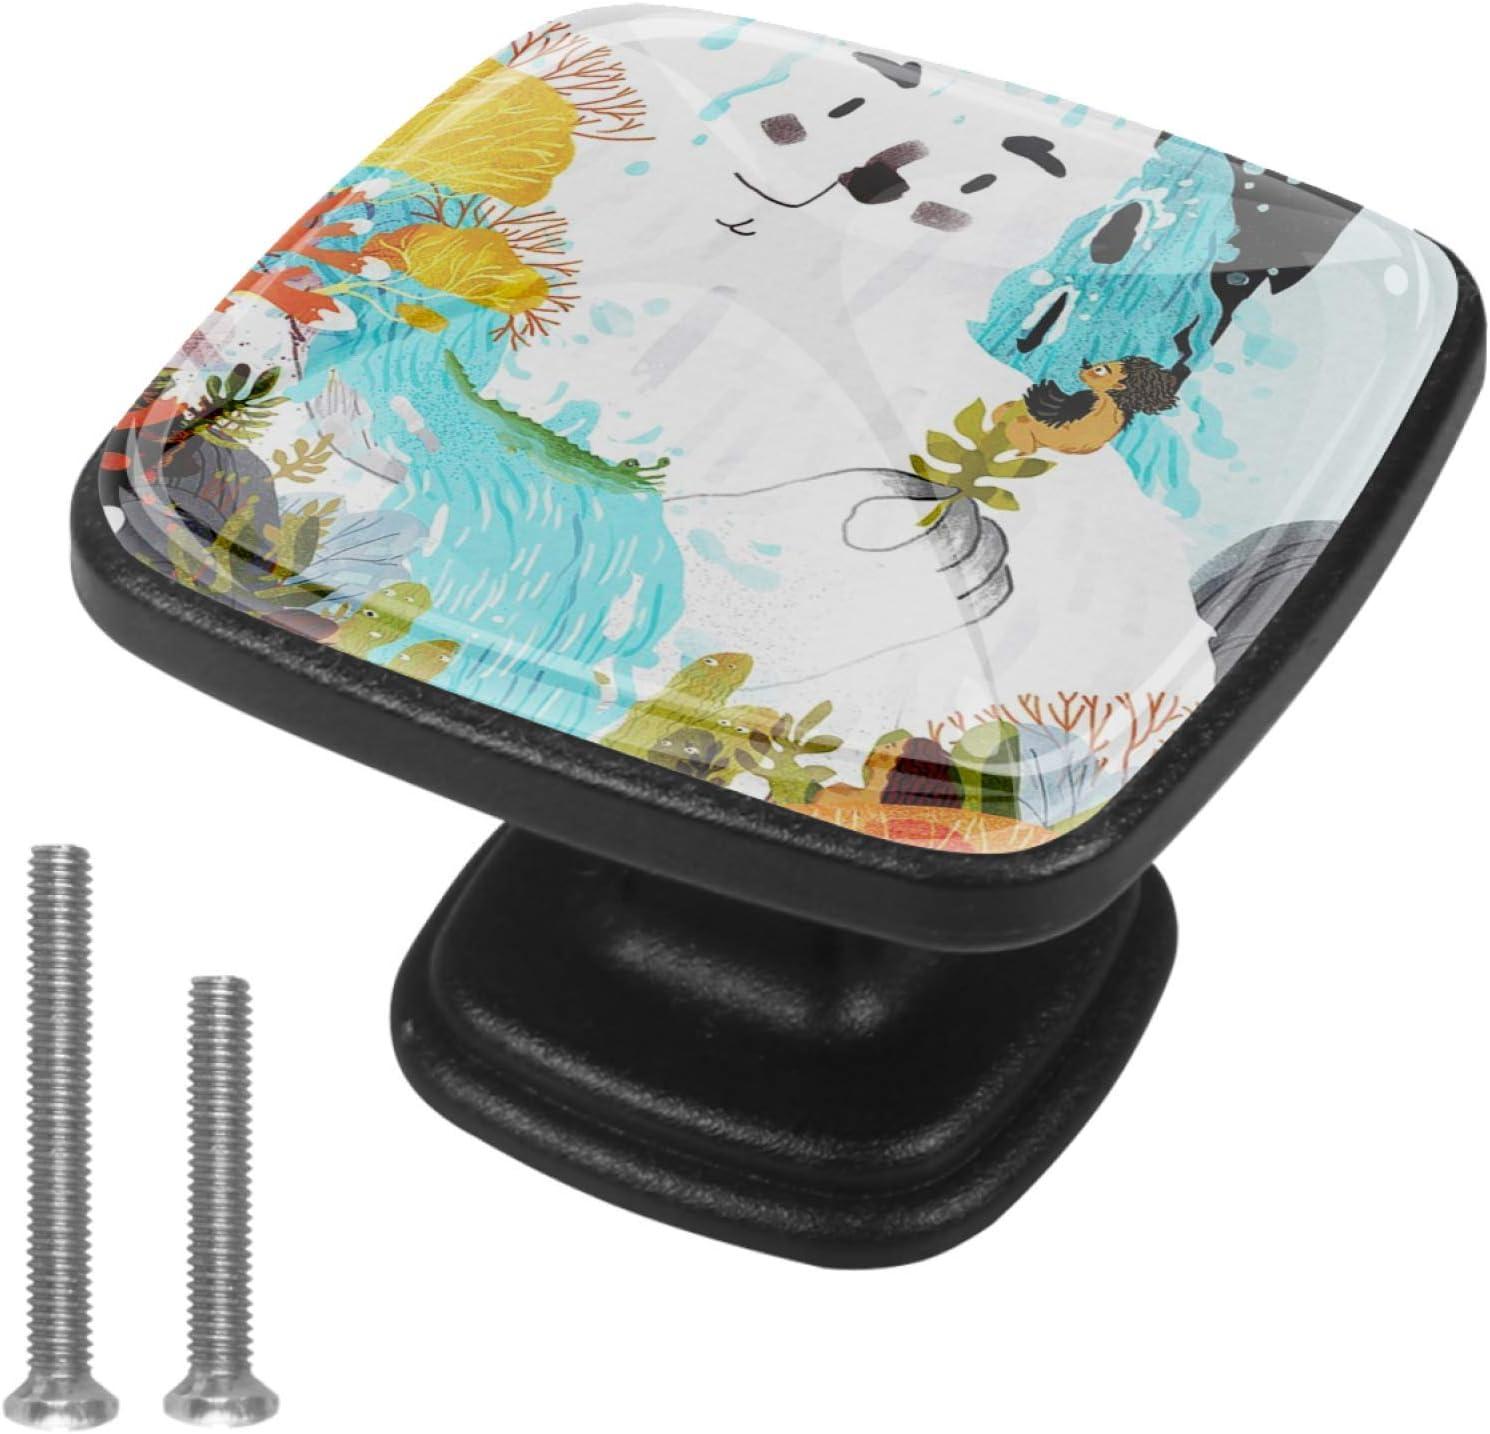 Round Cabinet Hardware Surprise price Knob 4 Pack 100